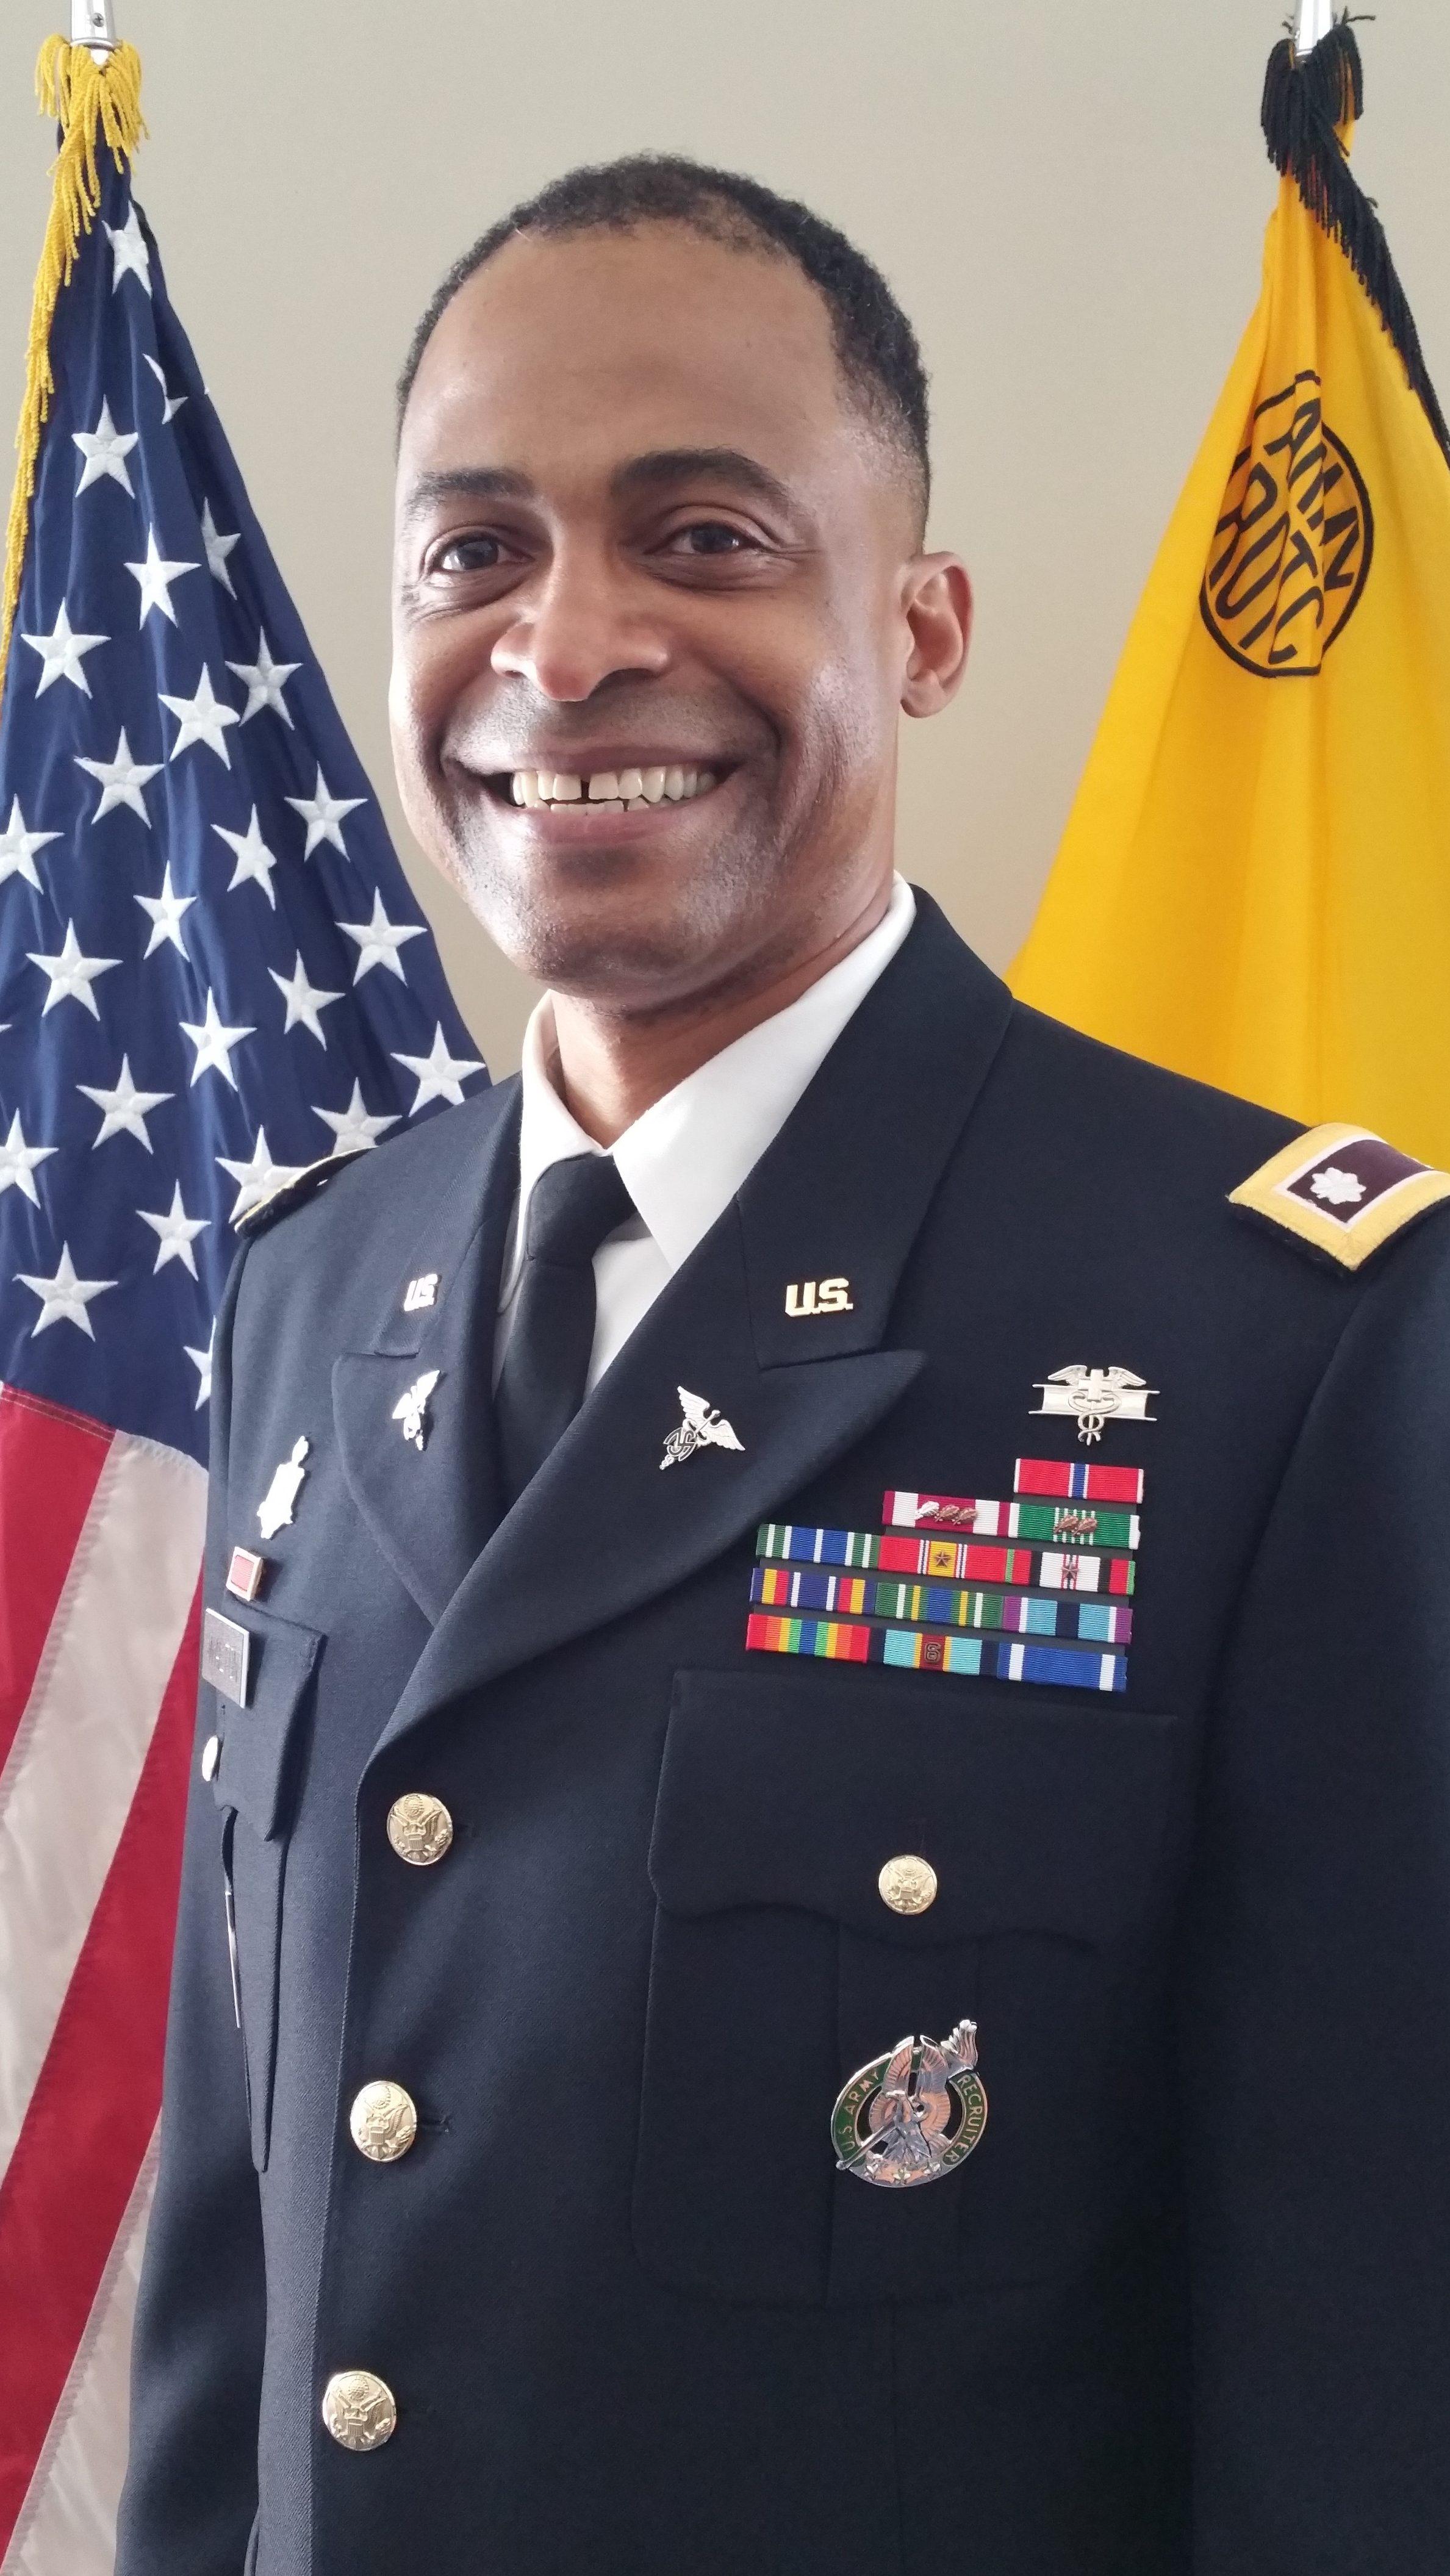 LTC Oliver T. Walton